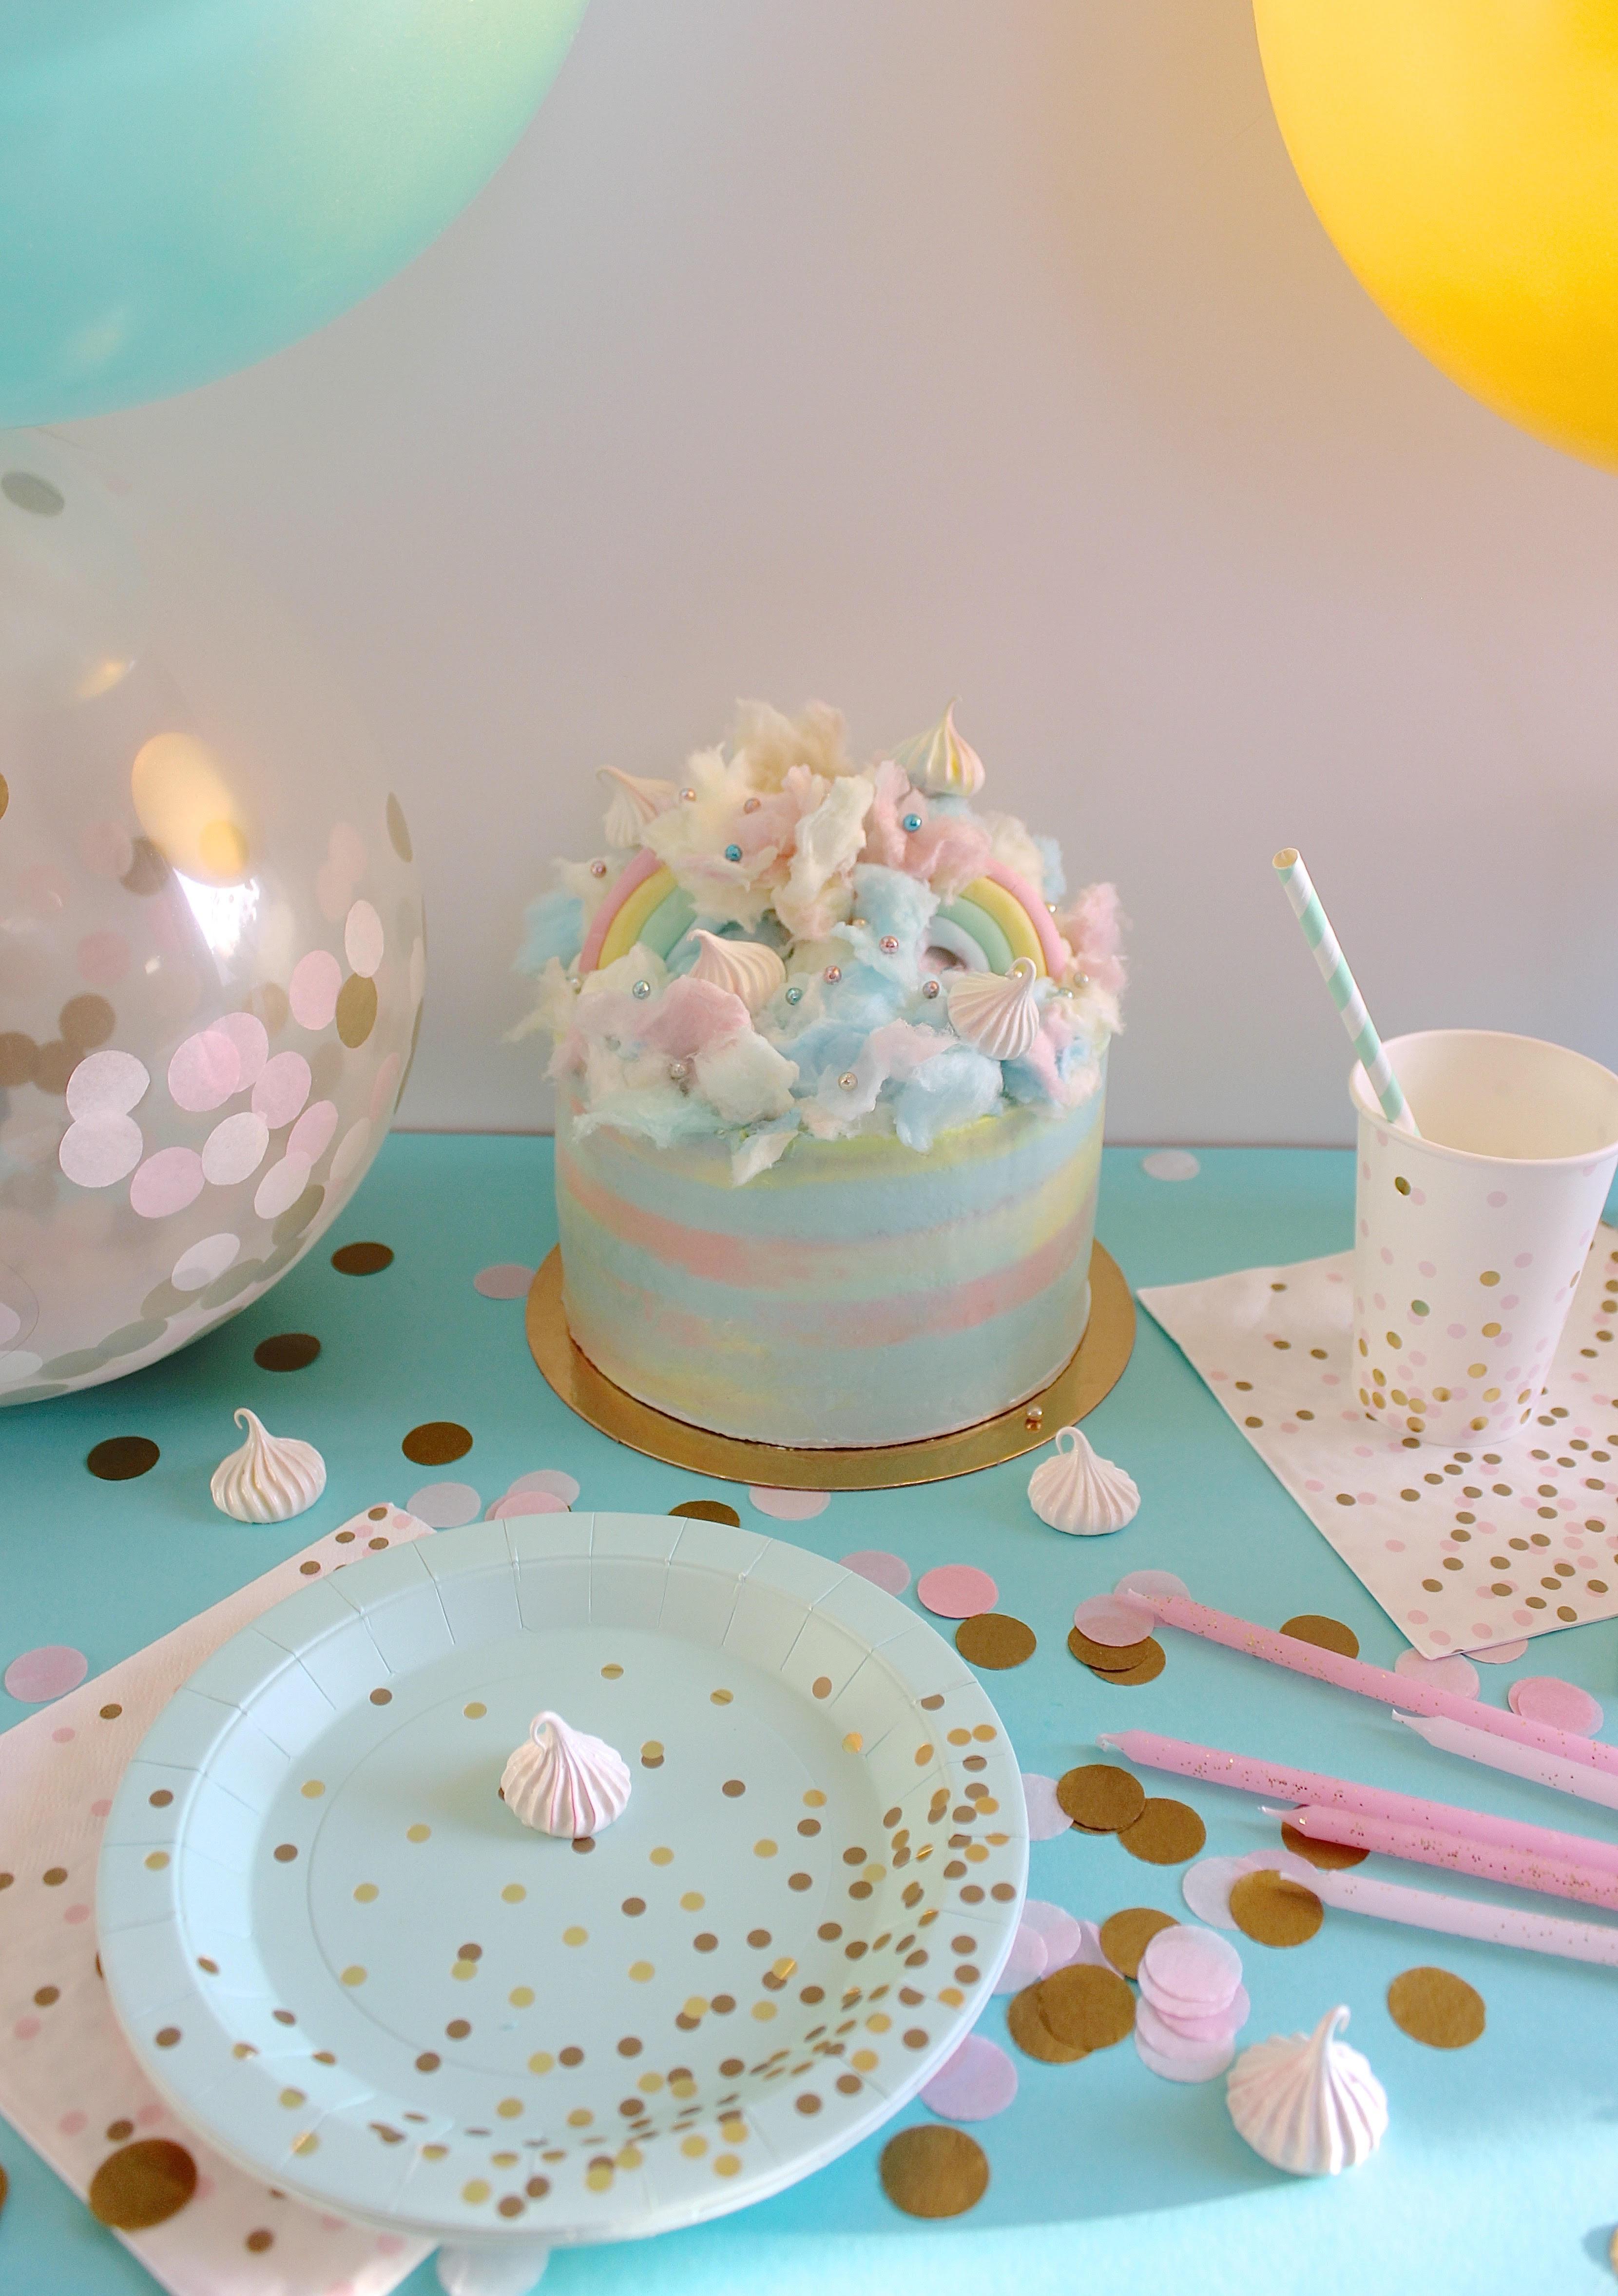 decoration anniversaire licorne pastel. Black Bedroom Furniture Sets. Home Design Ideas